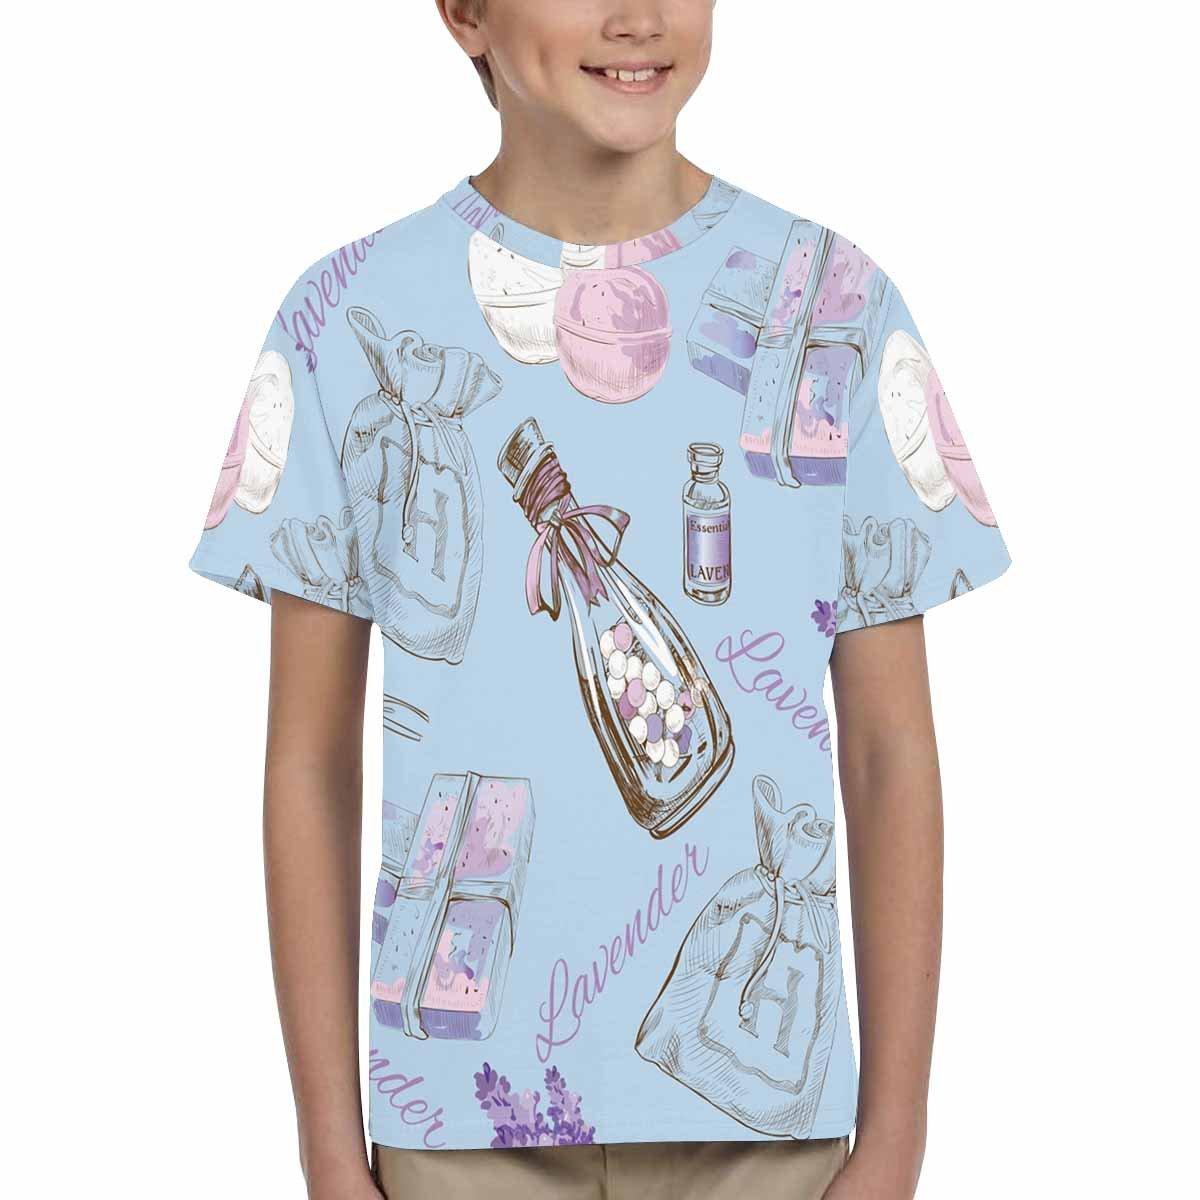 XS-XL INTERESTPRINT Youth Crew Neck T-Shirt Lavender Pattern